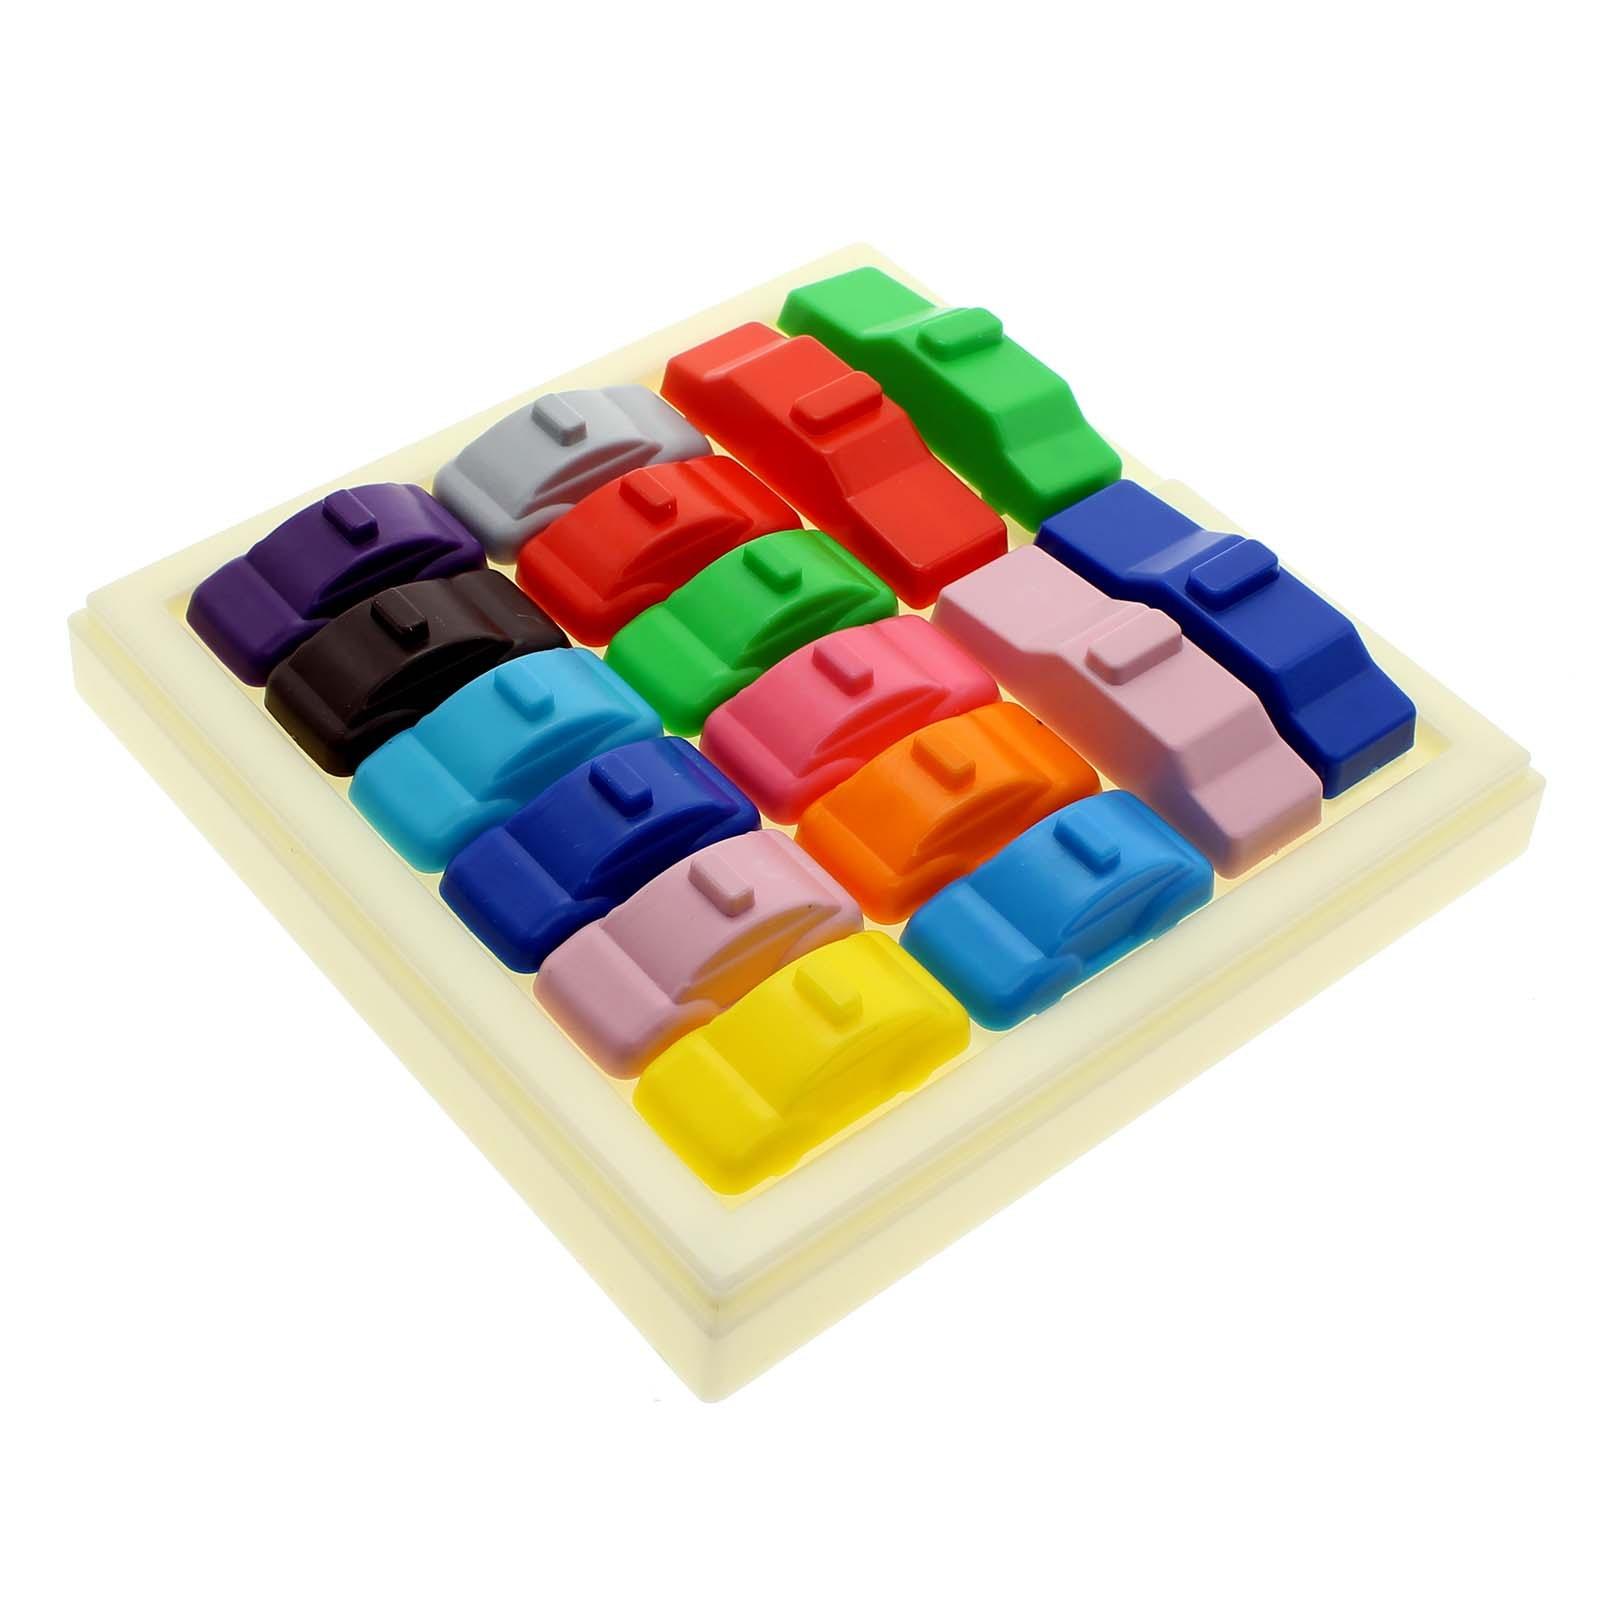 Hot Plastic IQ 160 Traffic Jam Challenges Slide Car Kids Toys Puzzle Escape Game